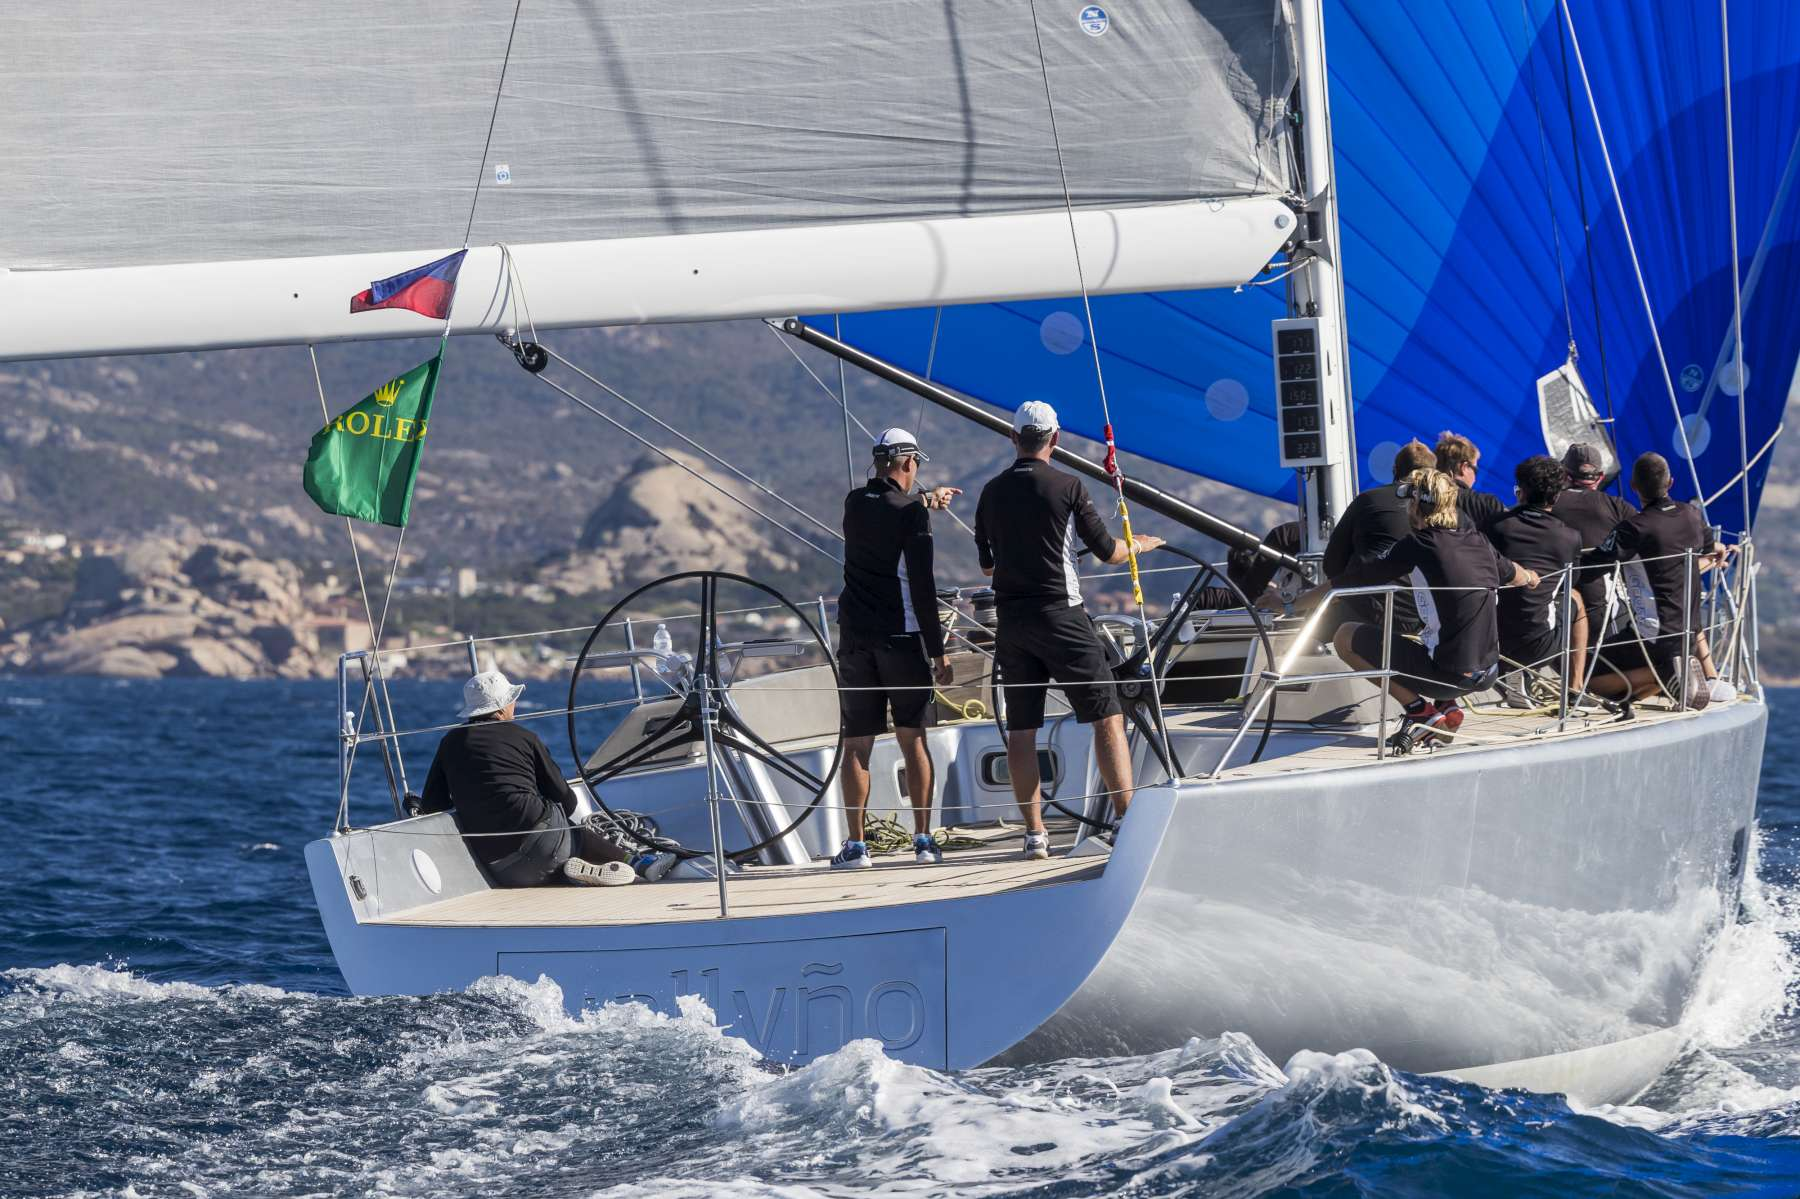 Maxi Yacht Rolex Cup 05 09 2017 Borlenghi 15